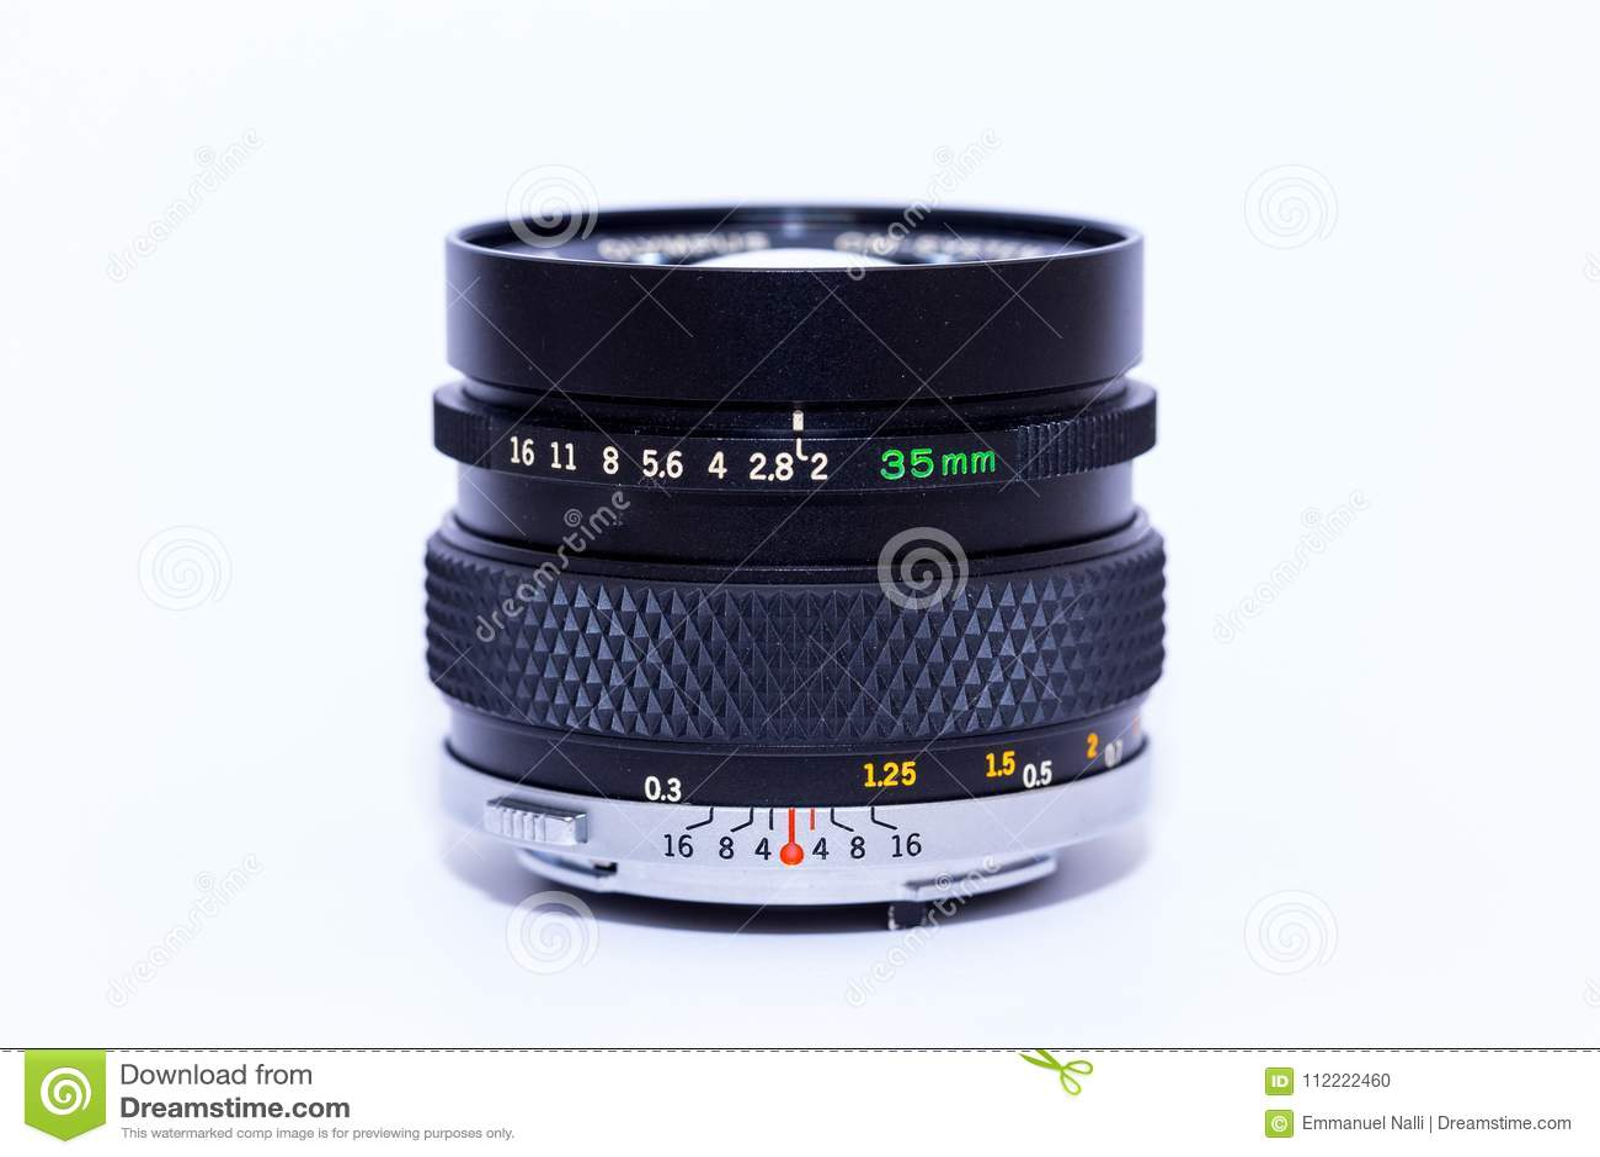 An analogue 35 mm lens